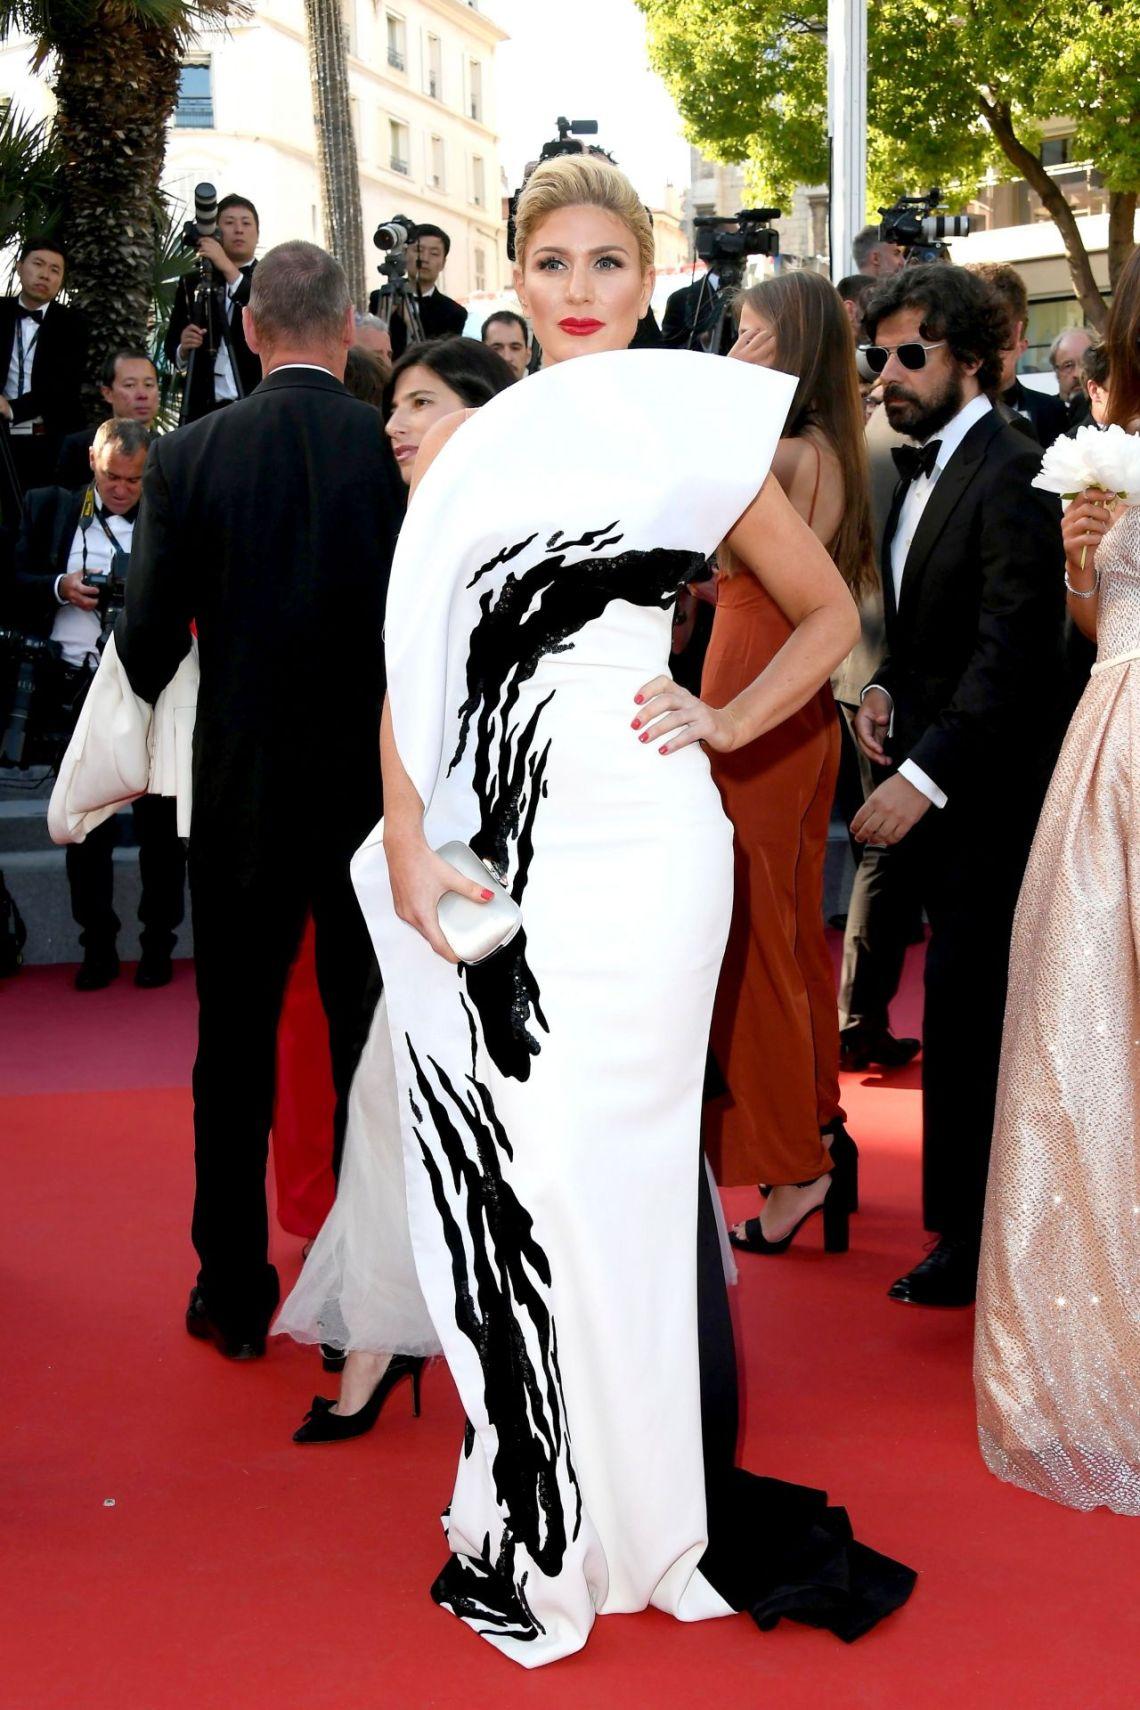 hofit-golan-cannes-film-festival-2018-closing-ceremony-red-carpet-3jean fares couture